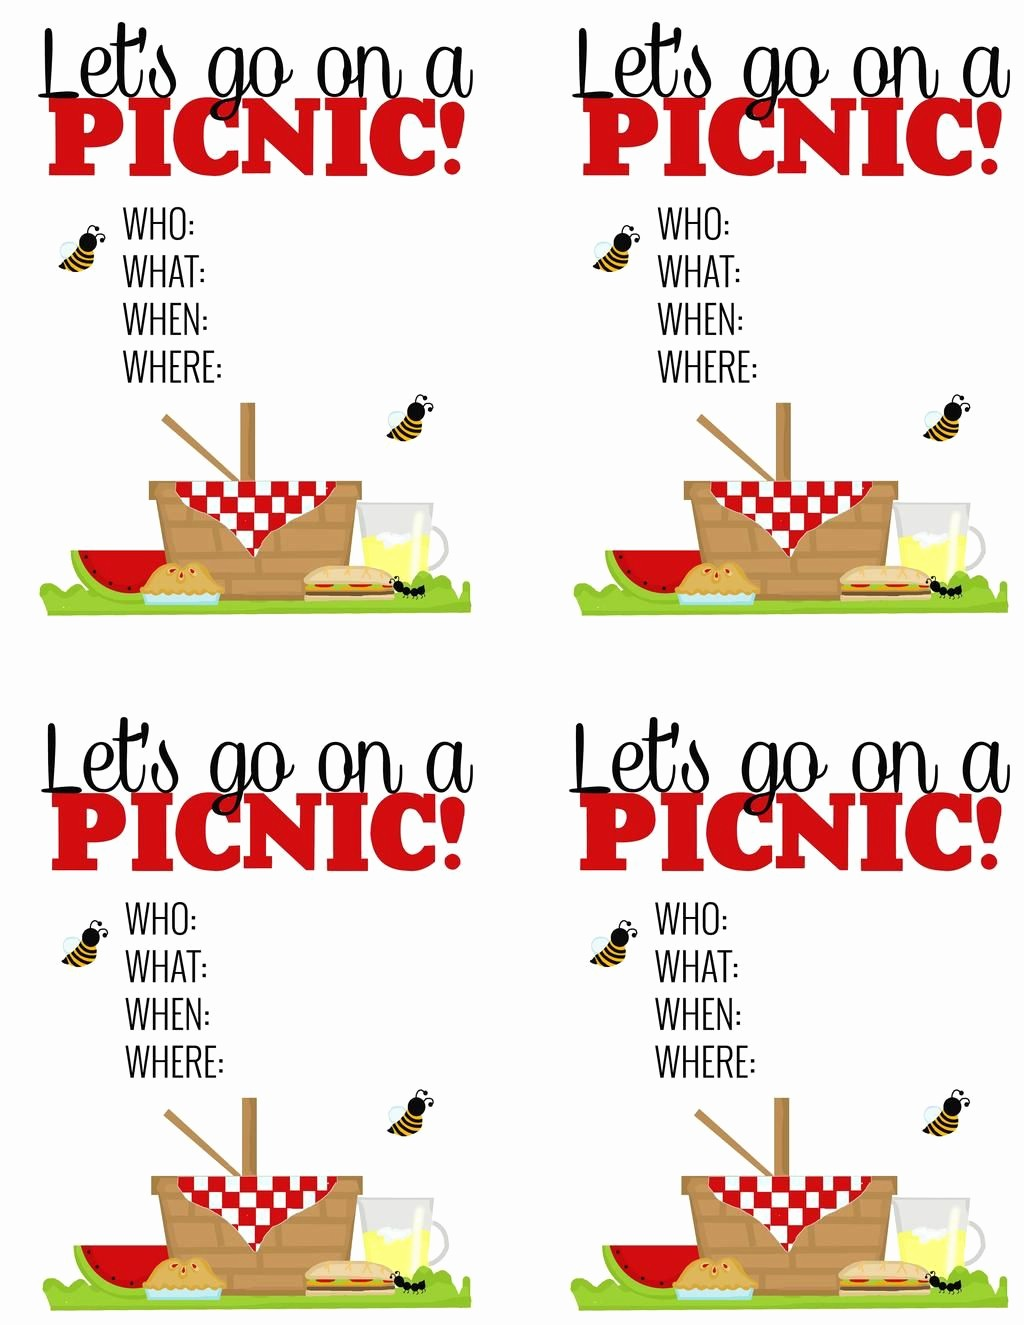 Free Downloadable Picnic Invitation Template Luxury Surprise Breakfast Picnic Free Printable Picnic